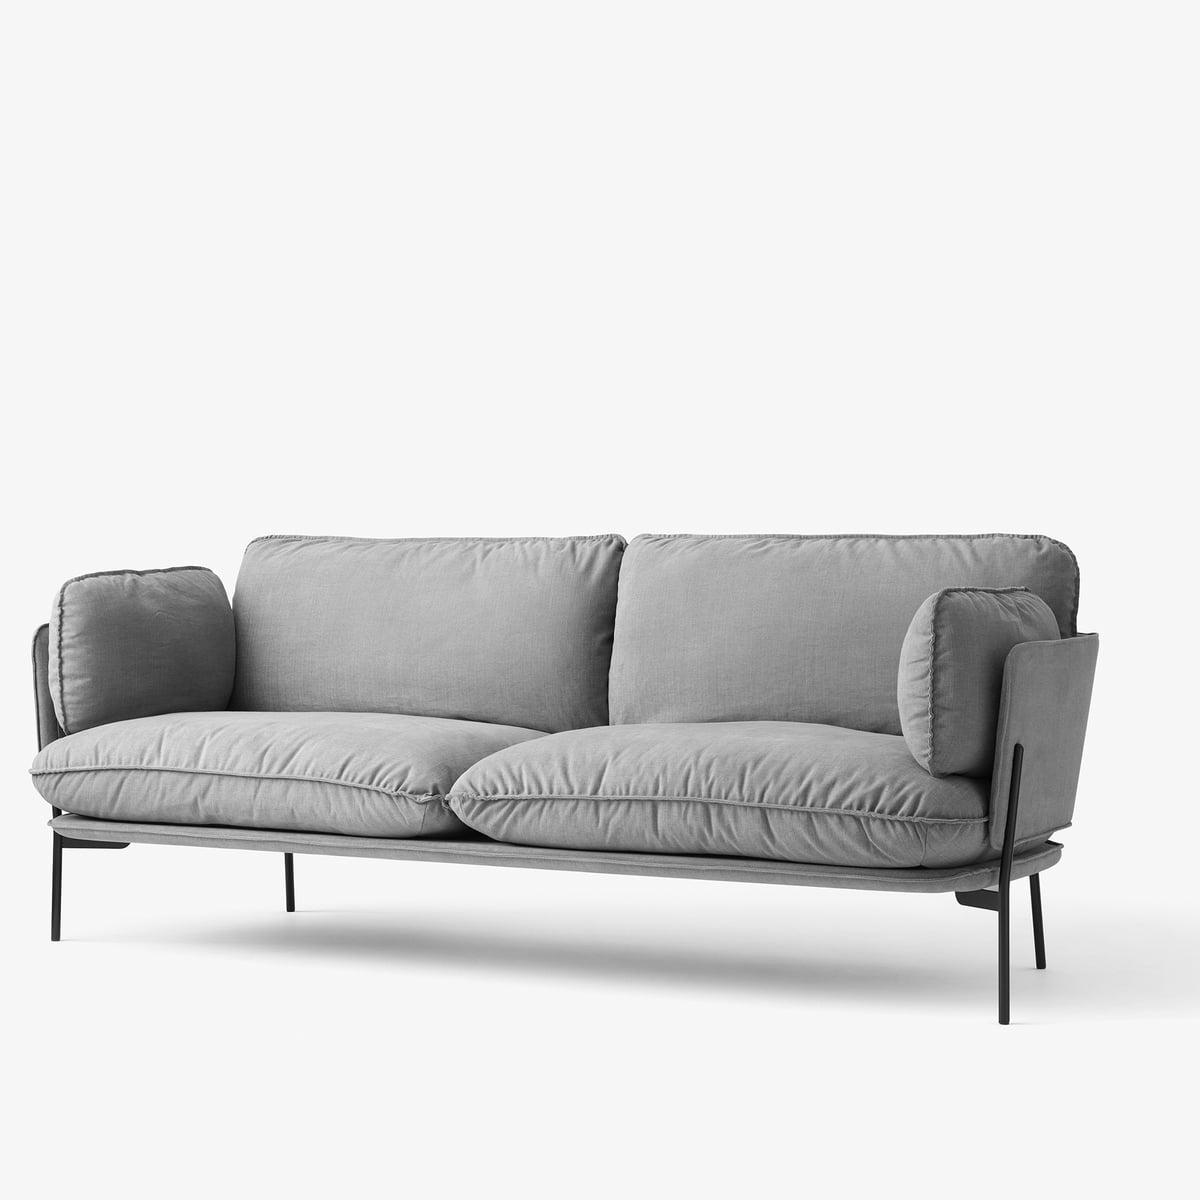 Cloud Sofa Ln 3 2 Von Tradition